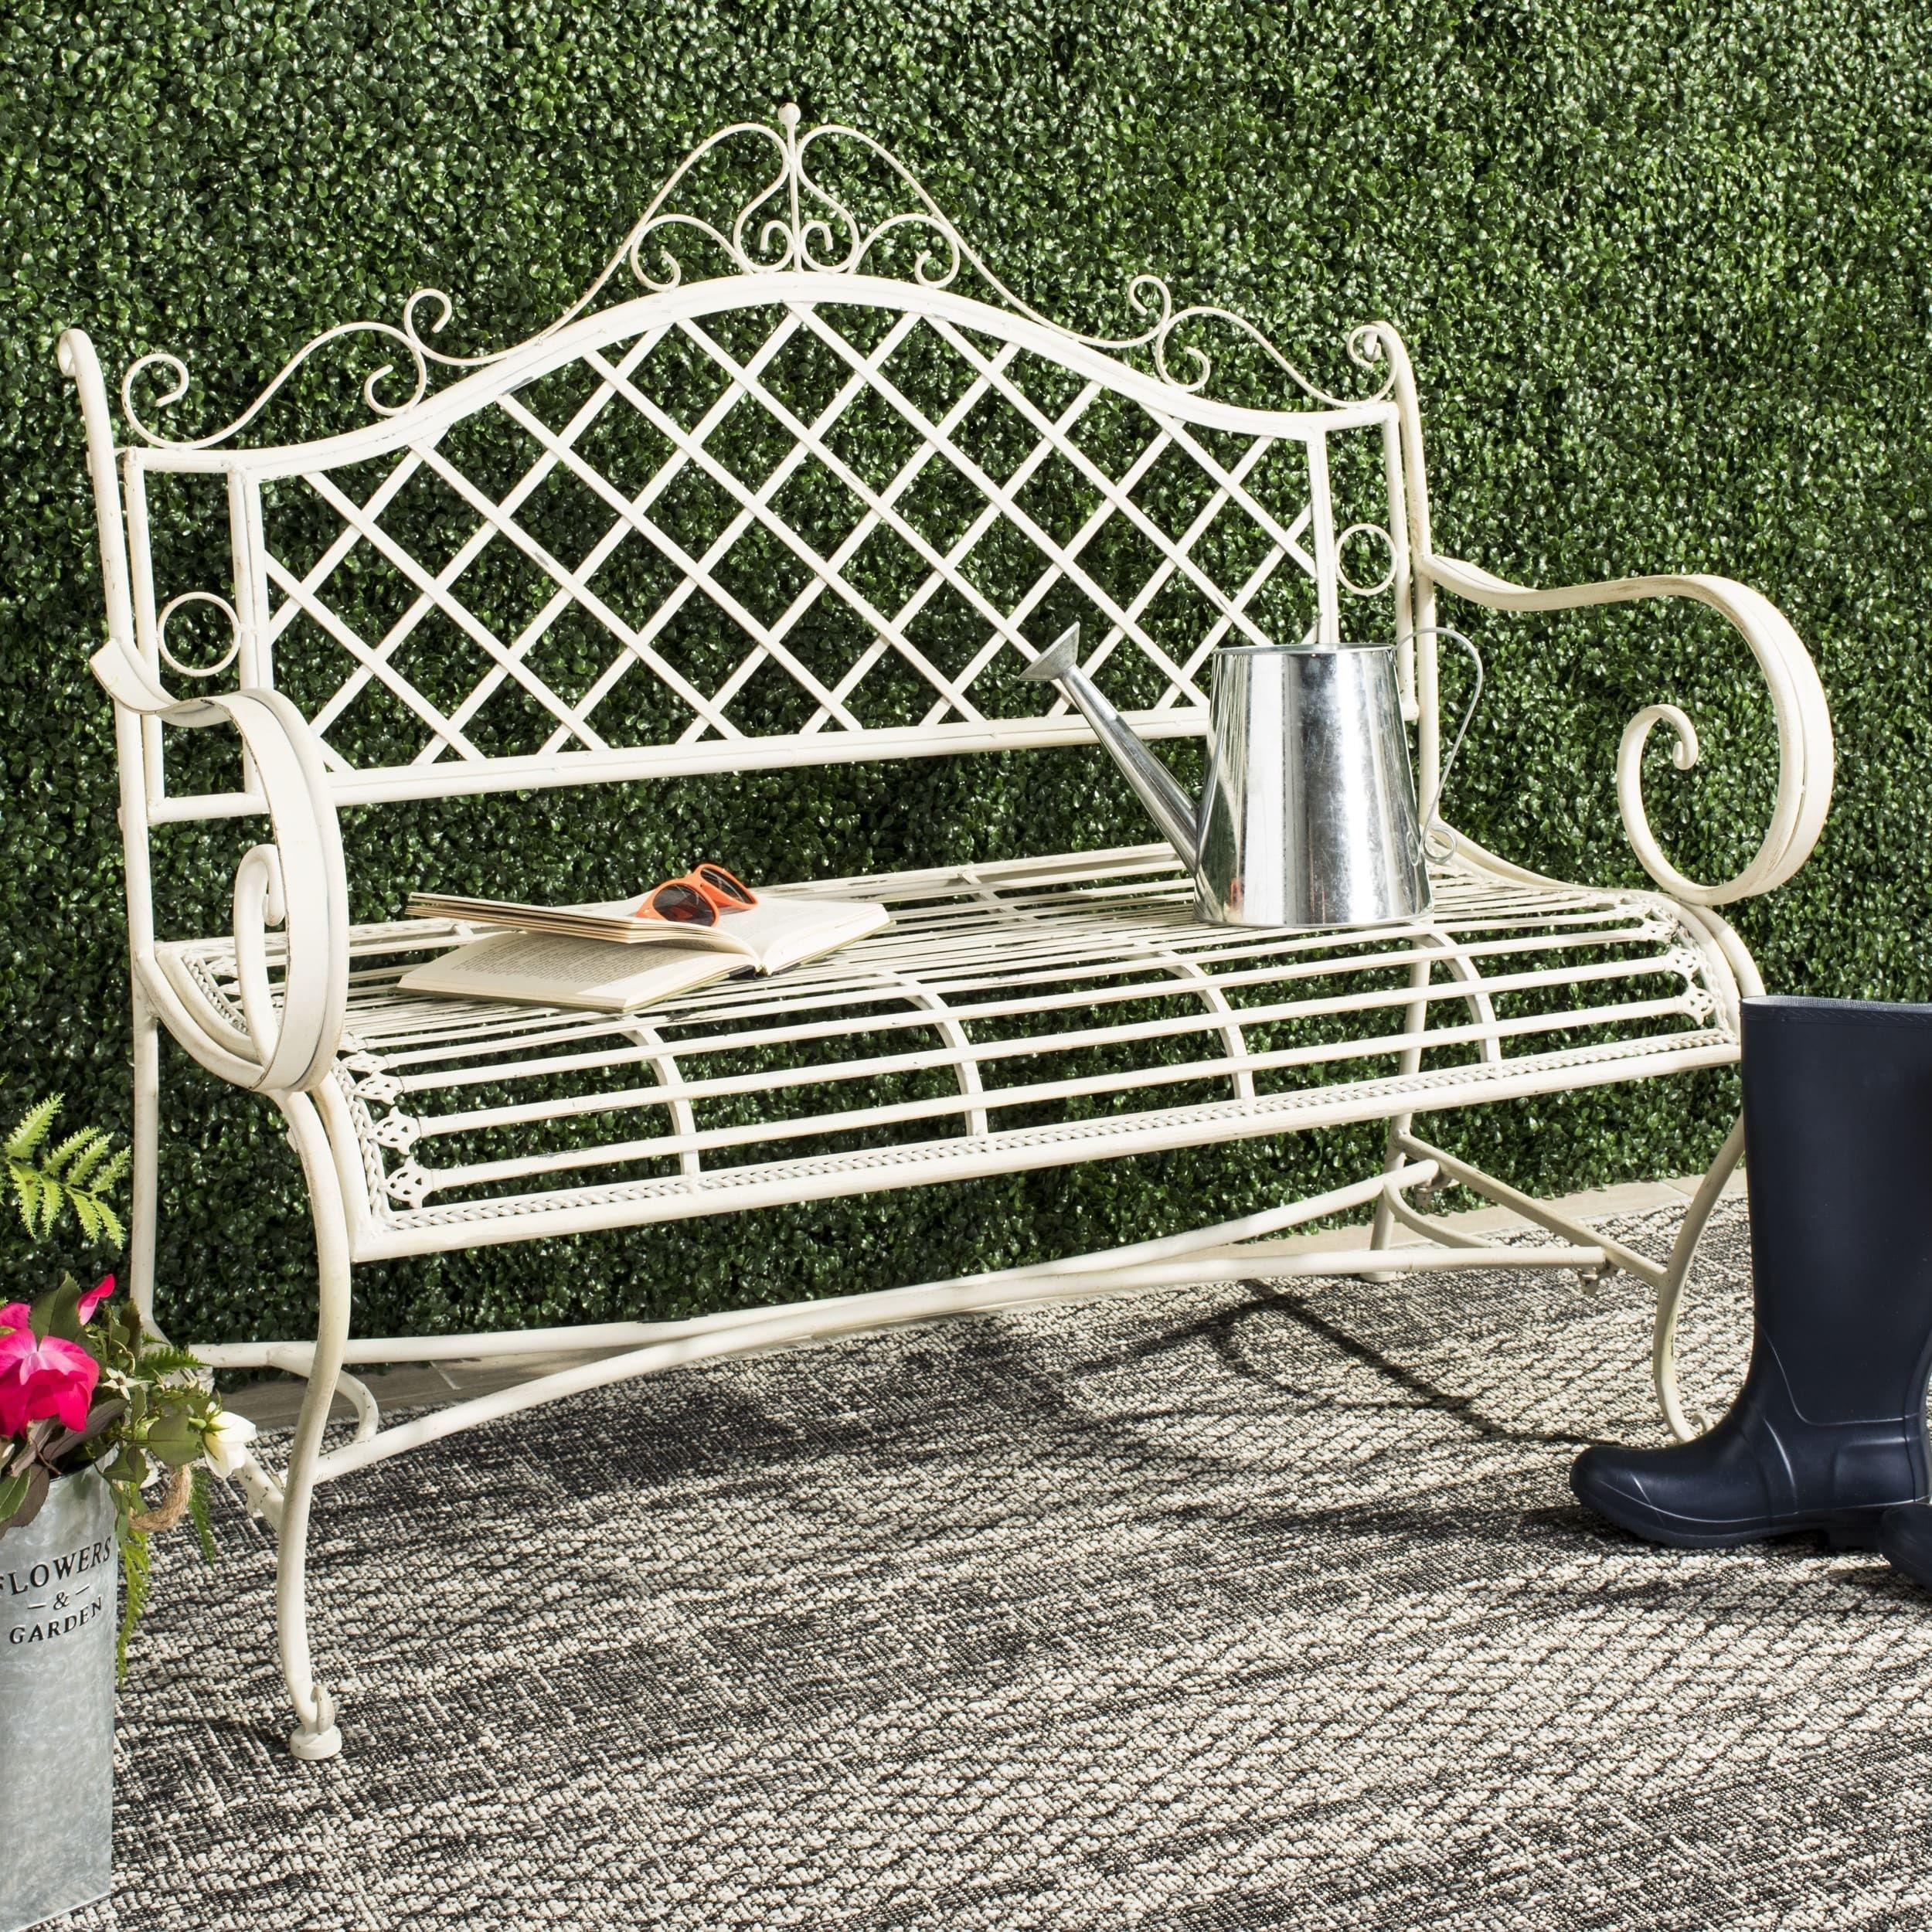 wrought iron garden furniture. Safavieh Outdoor Living Abner White Wrought Iron Garden Bench (45.75-Inches) (PAT5017A Furniture